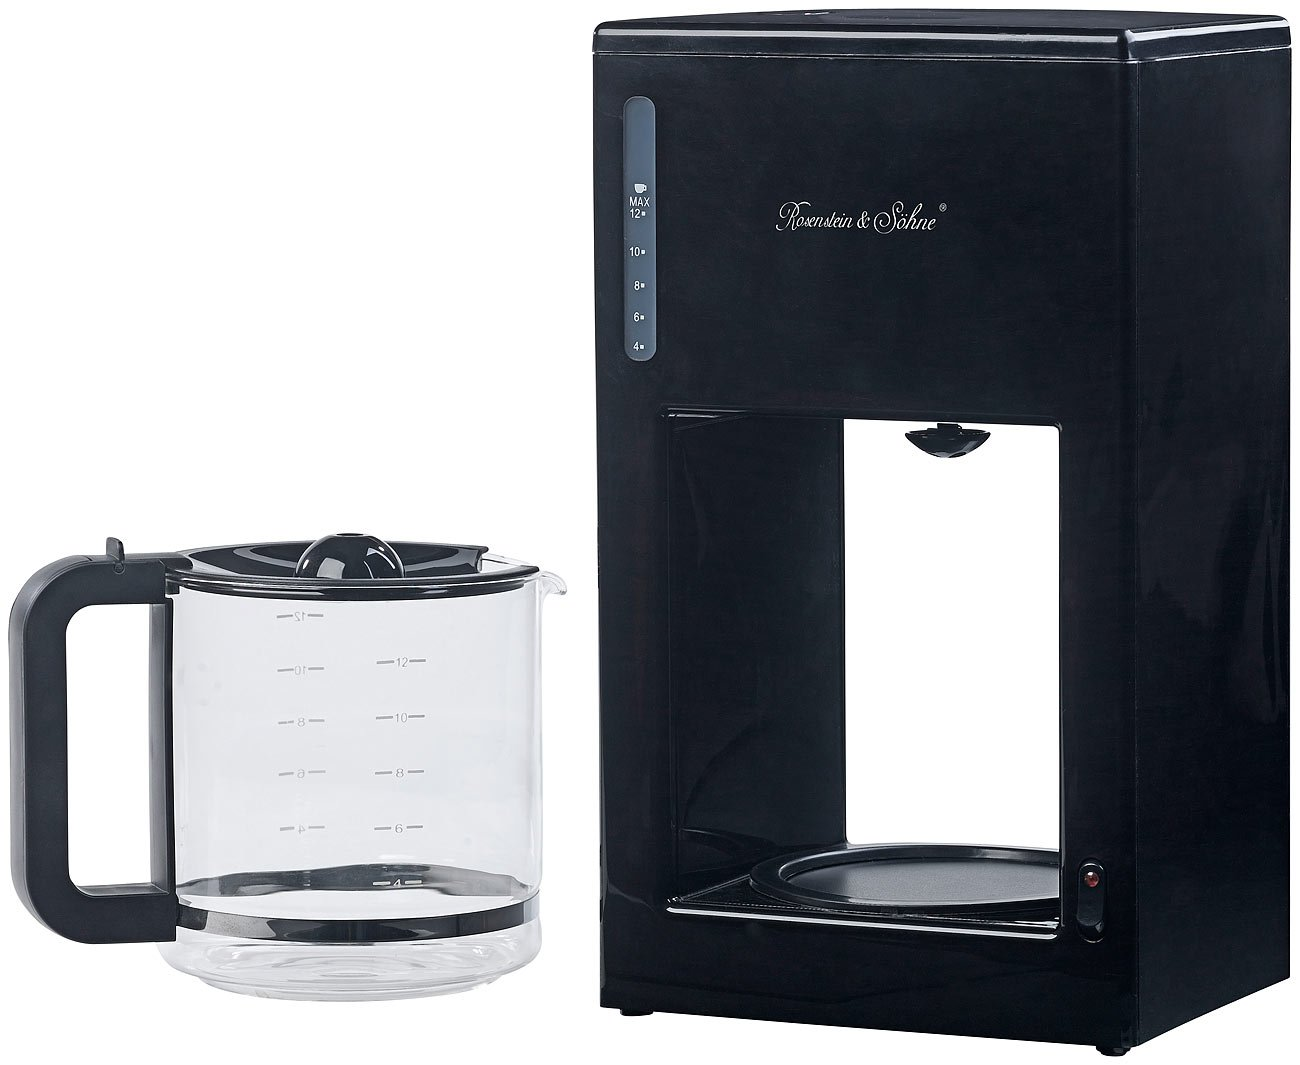 Rosenstein & Söhne - Máquina de café (: Diseño Moderno de cafetera eléctrica para hasta 12 tazas, 1000 W (Café Caliente Máquinas con soportes): Amazon.es: ...